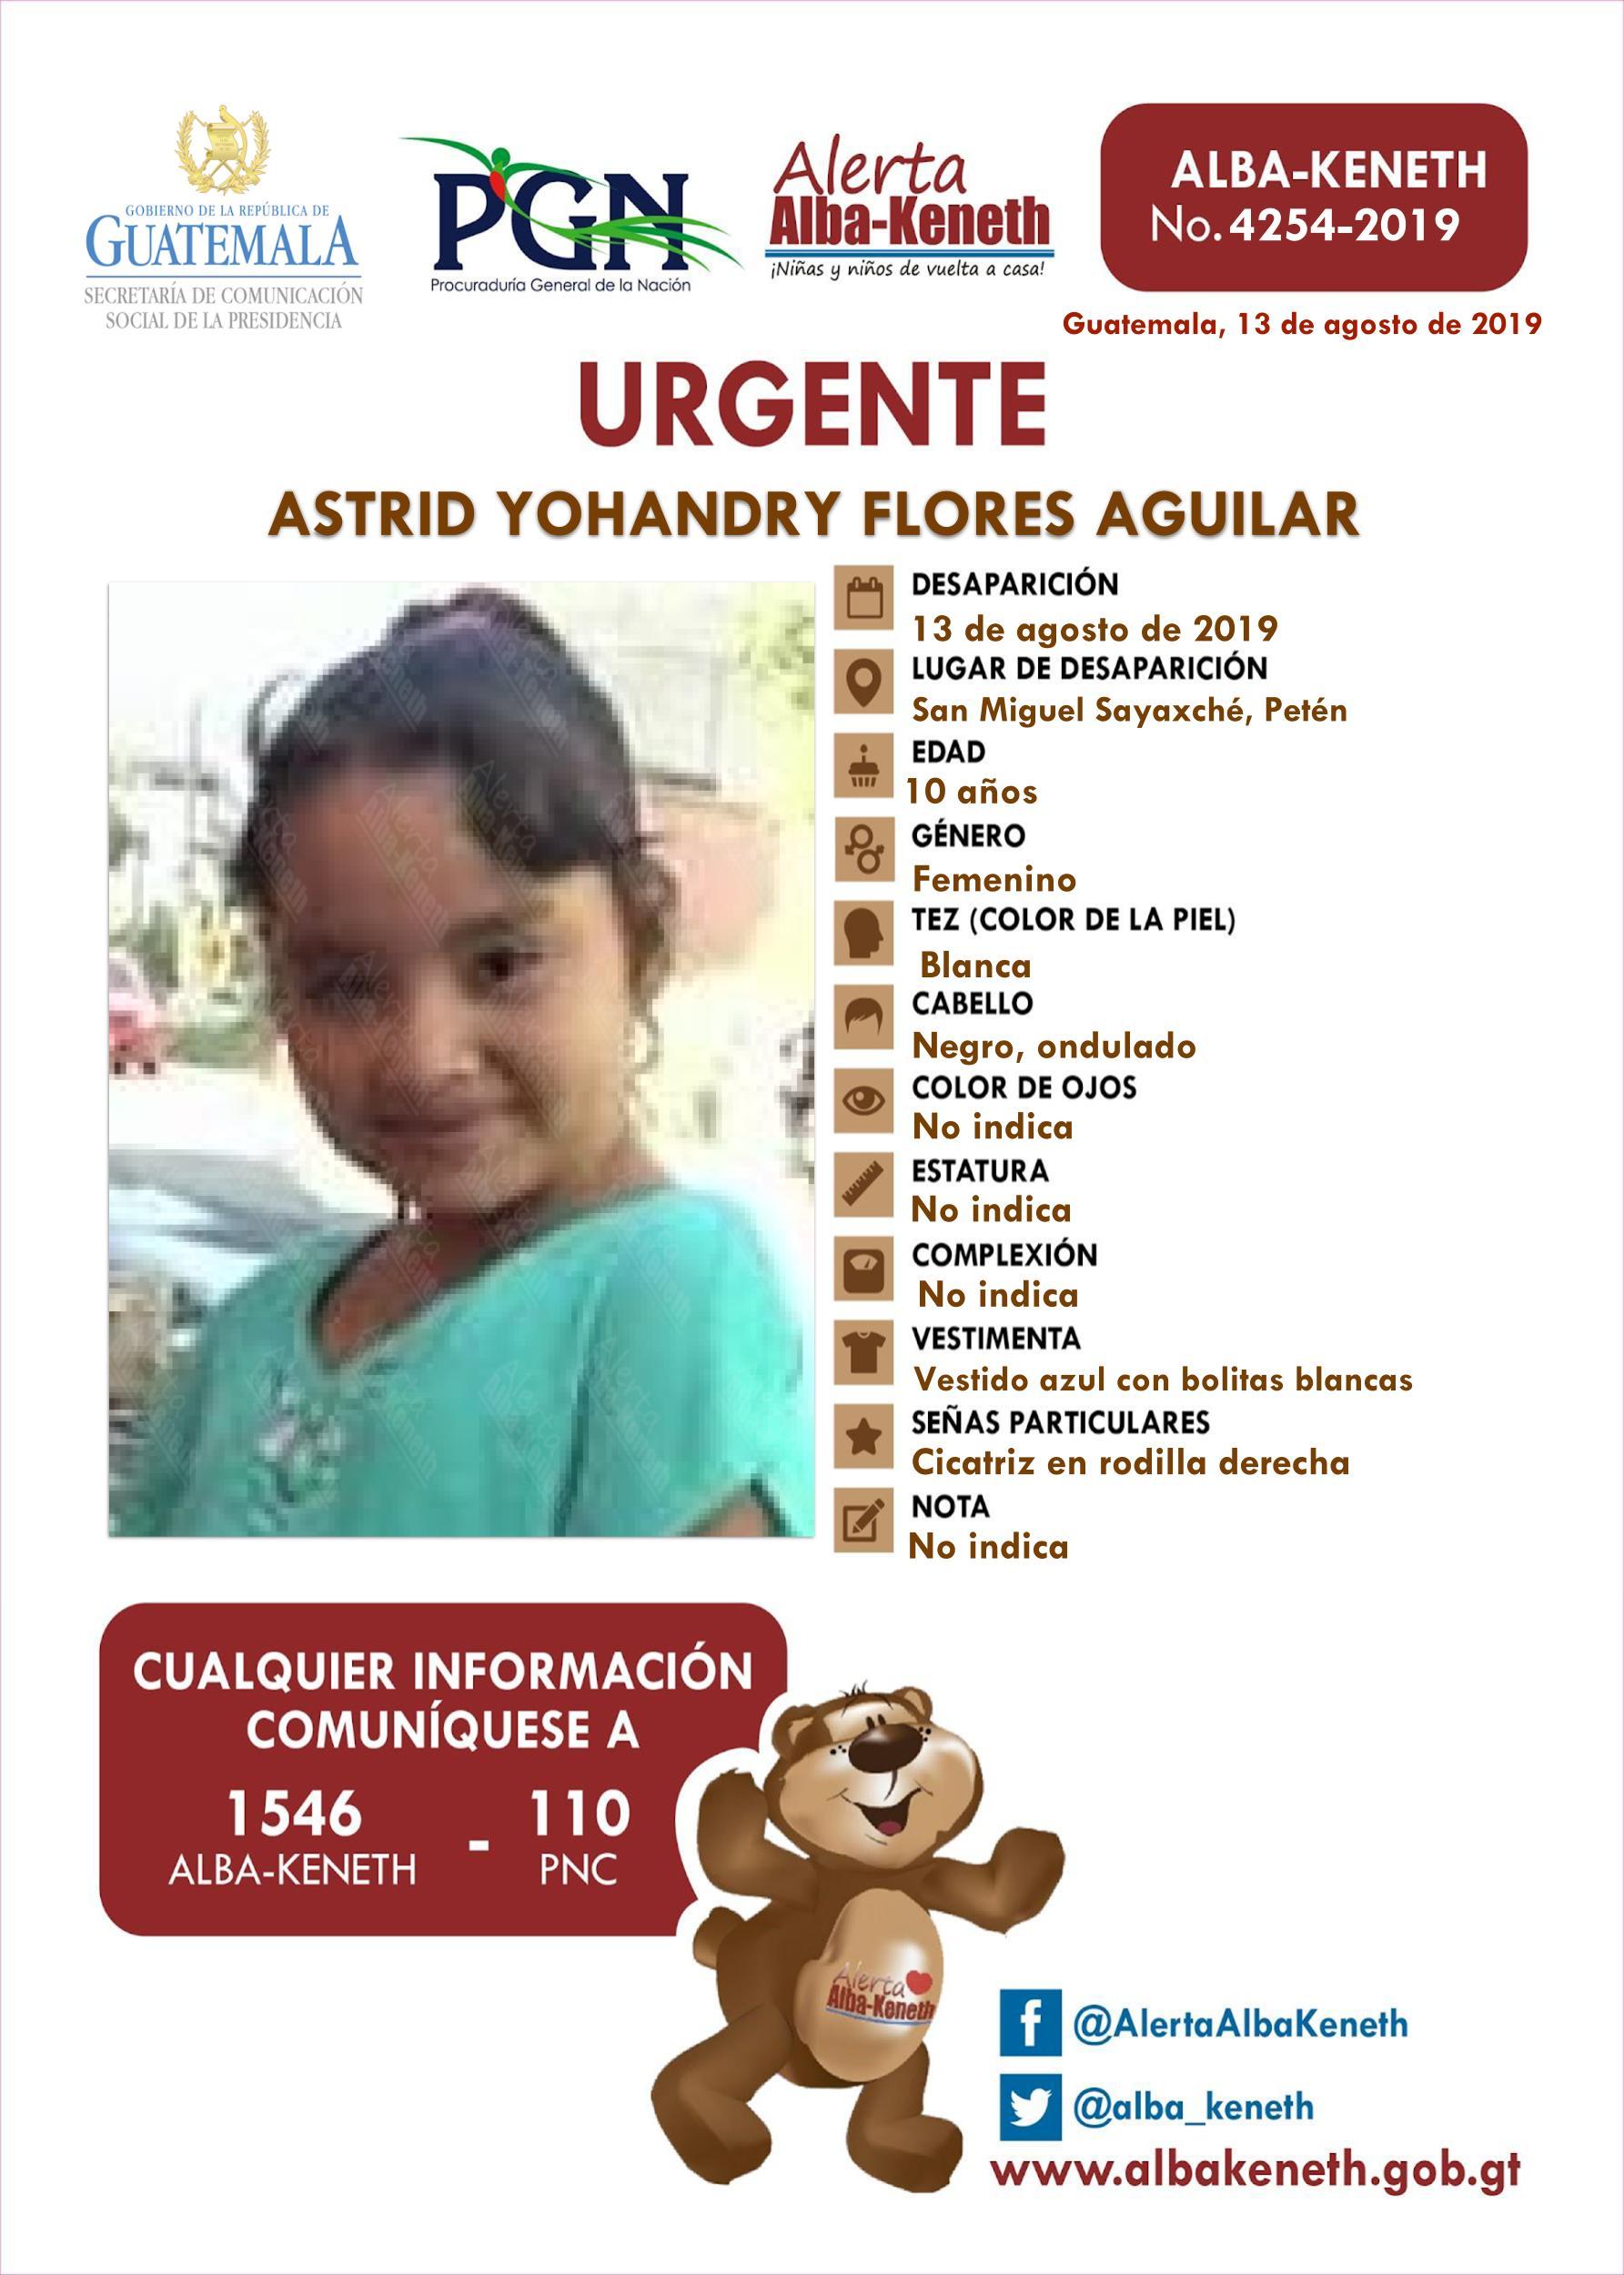 Astrid Yohandry Flores Aguilar